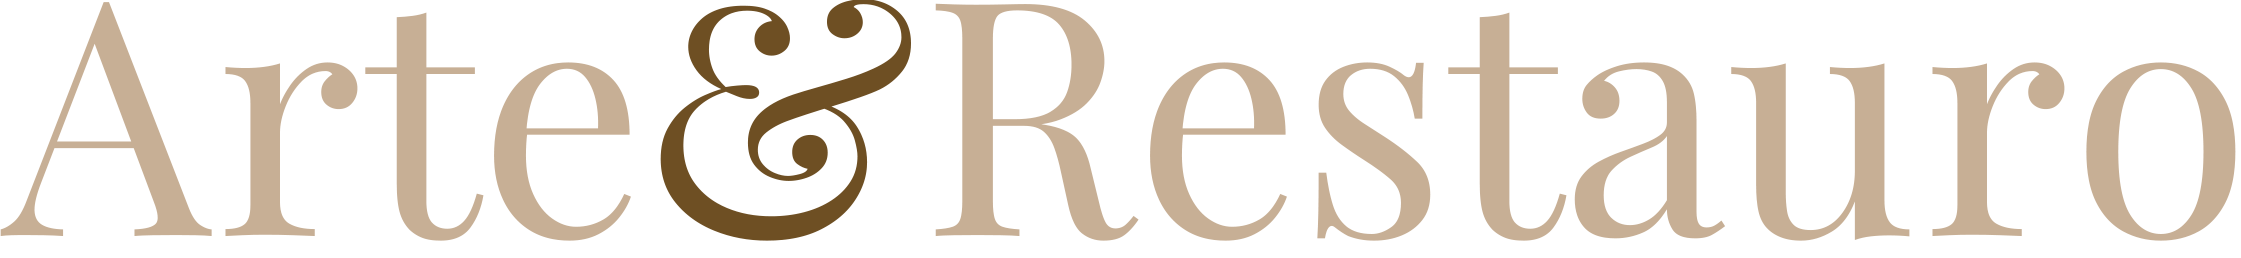 Arte & Restauro Ravenna